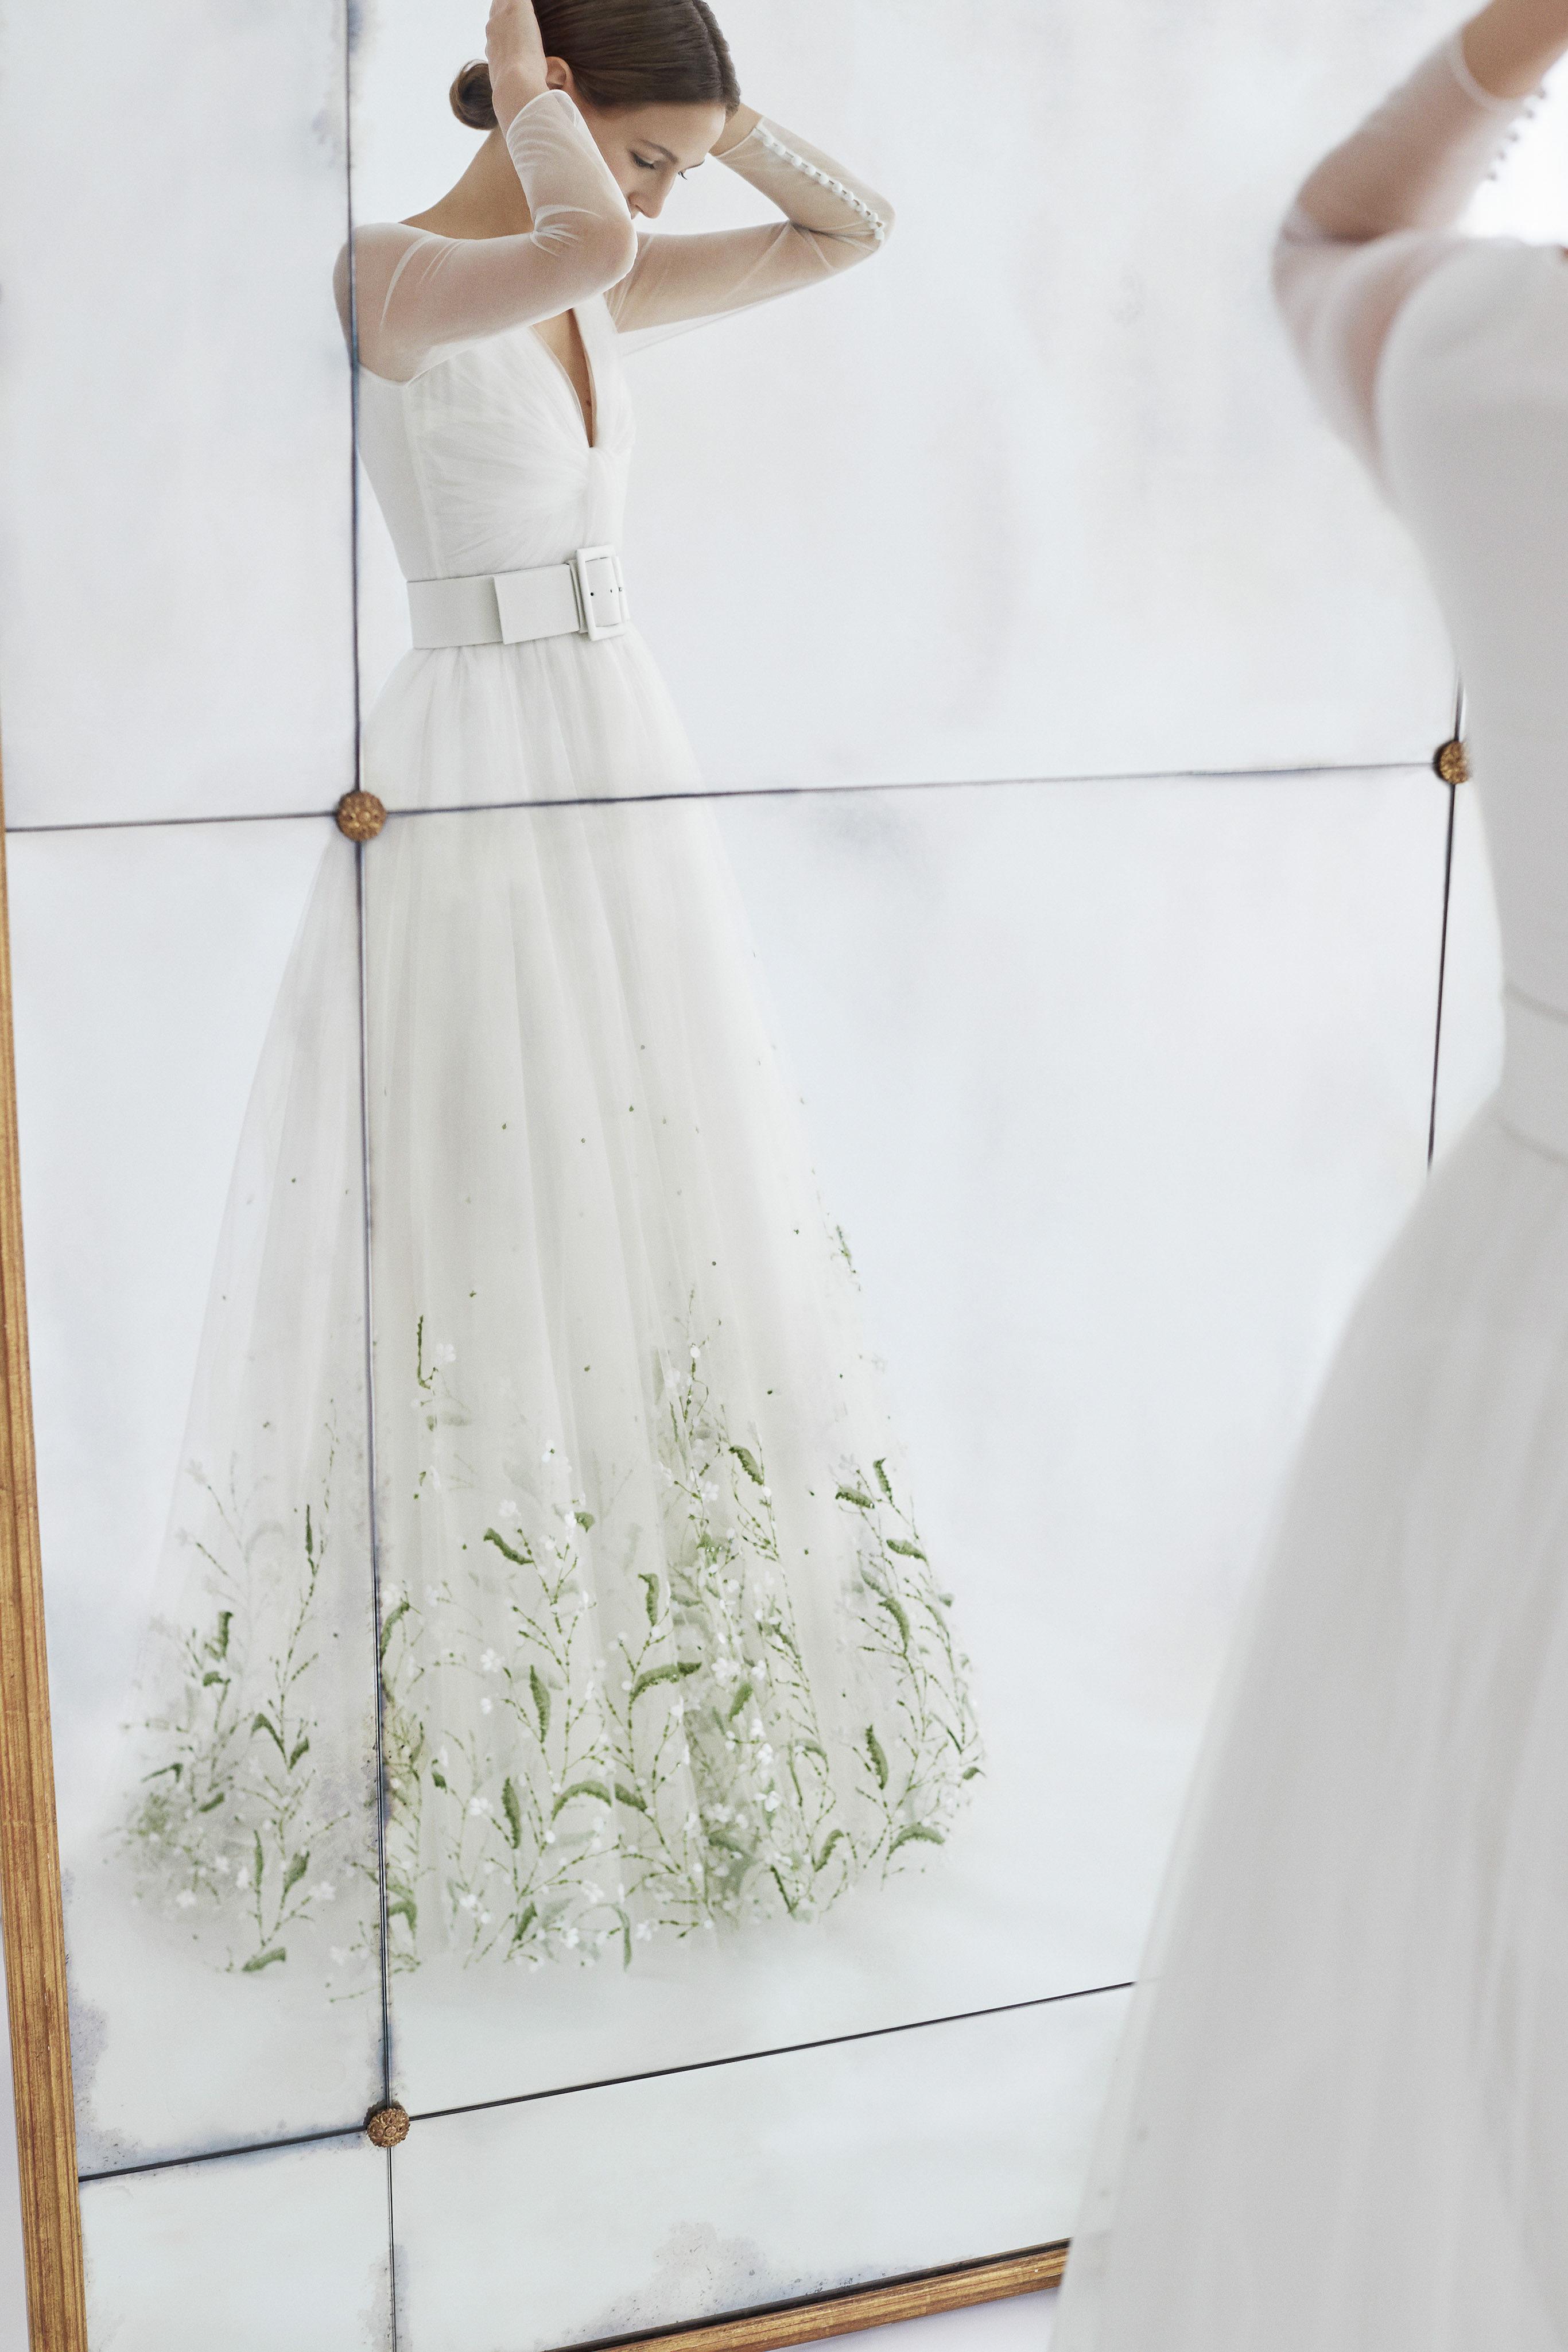 carolina herrera wedding dress fall 2018 tulle greenery embellished